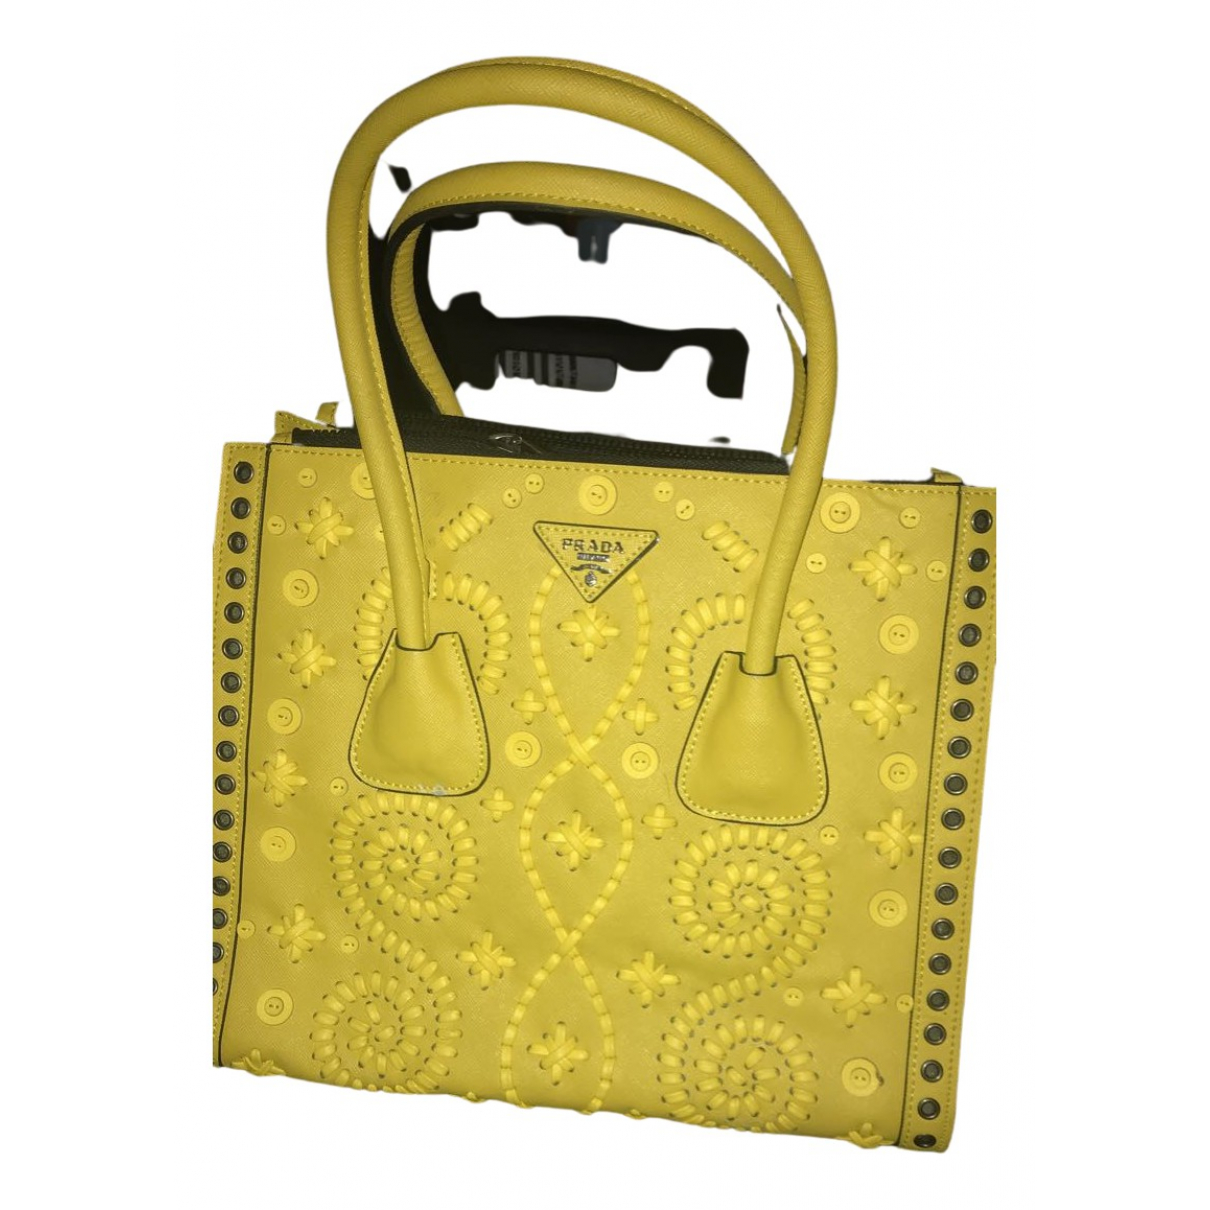 Prada Ouverture Yellow Leather handbag for Women N